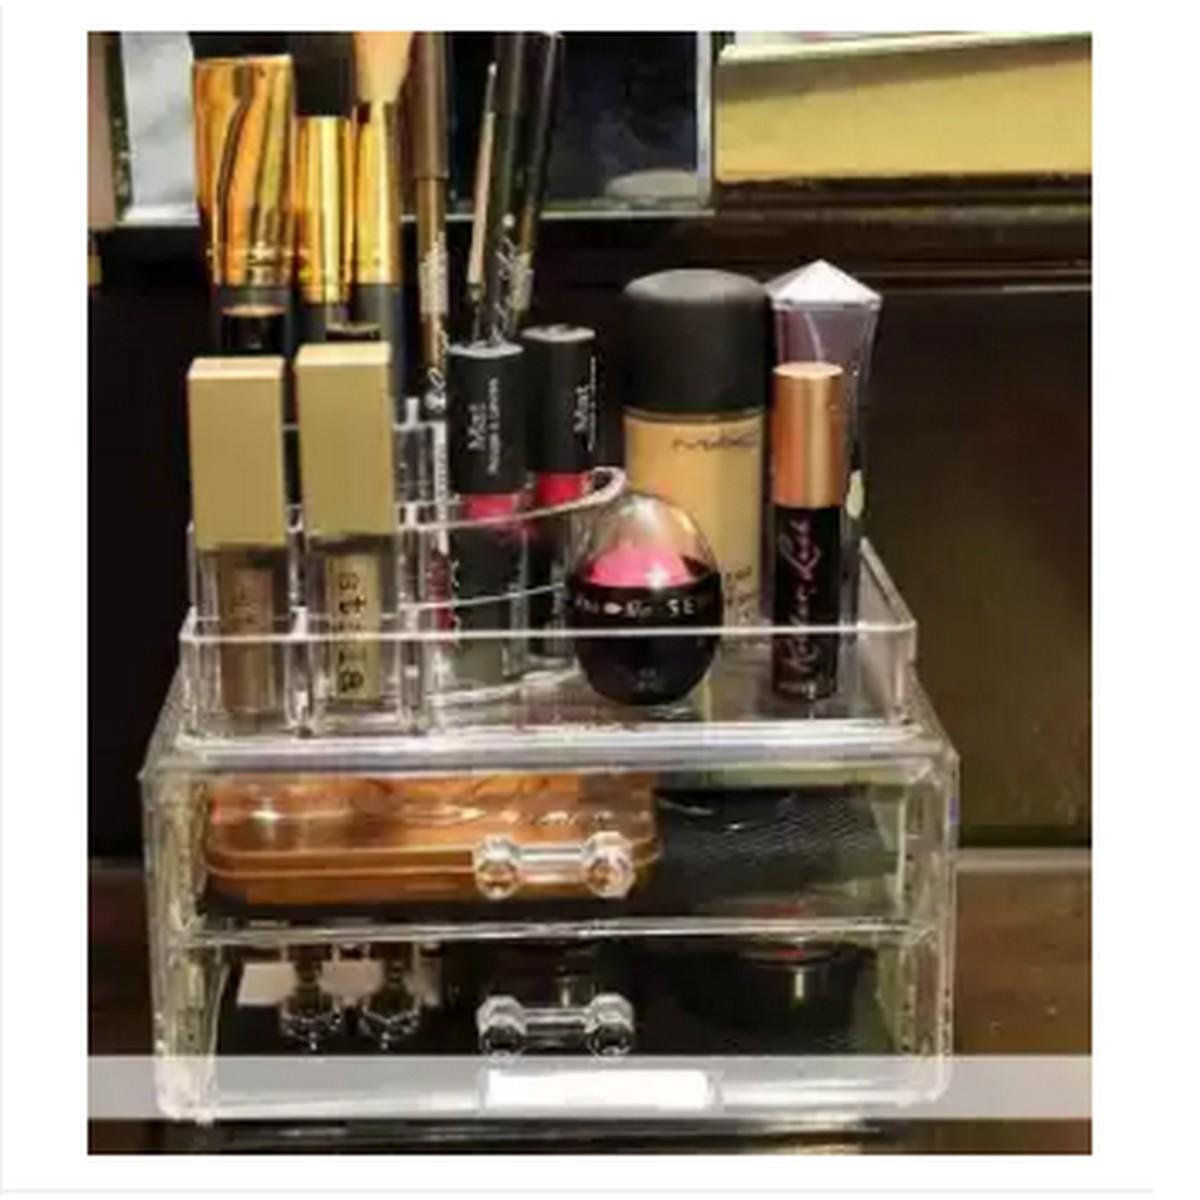 Acrylic 2 Drawers Trapezoid Lipstick Makeup Display Stand Cosmetic Organizer Holder Case jewelry Box Storage